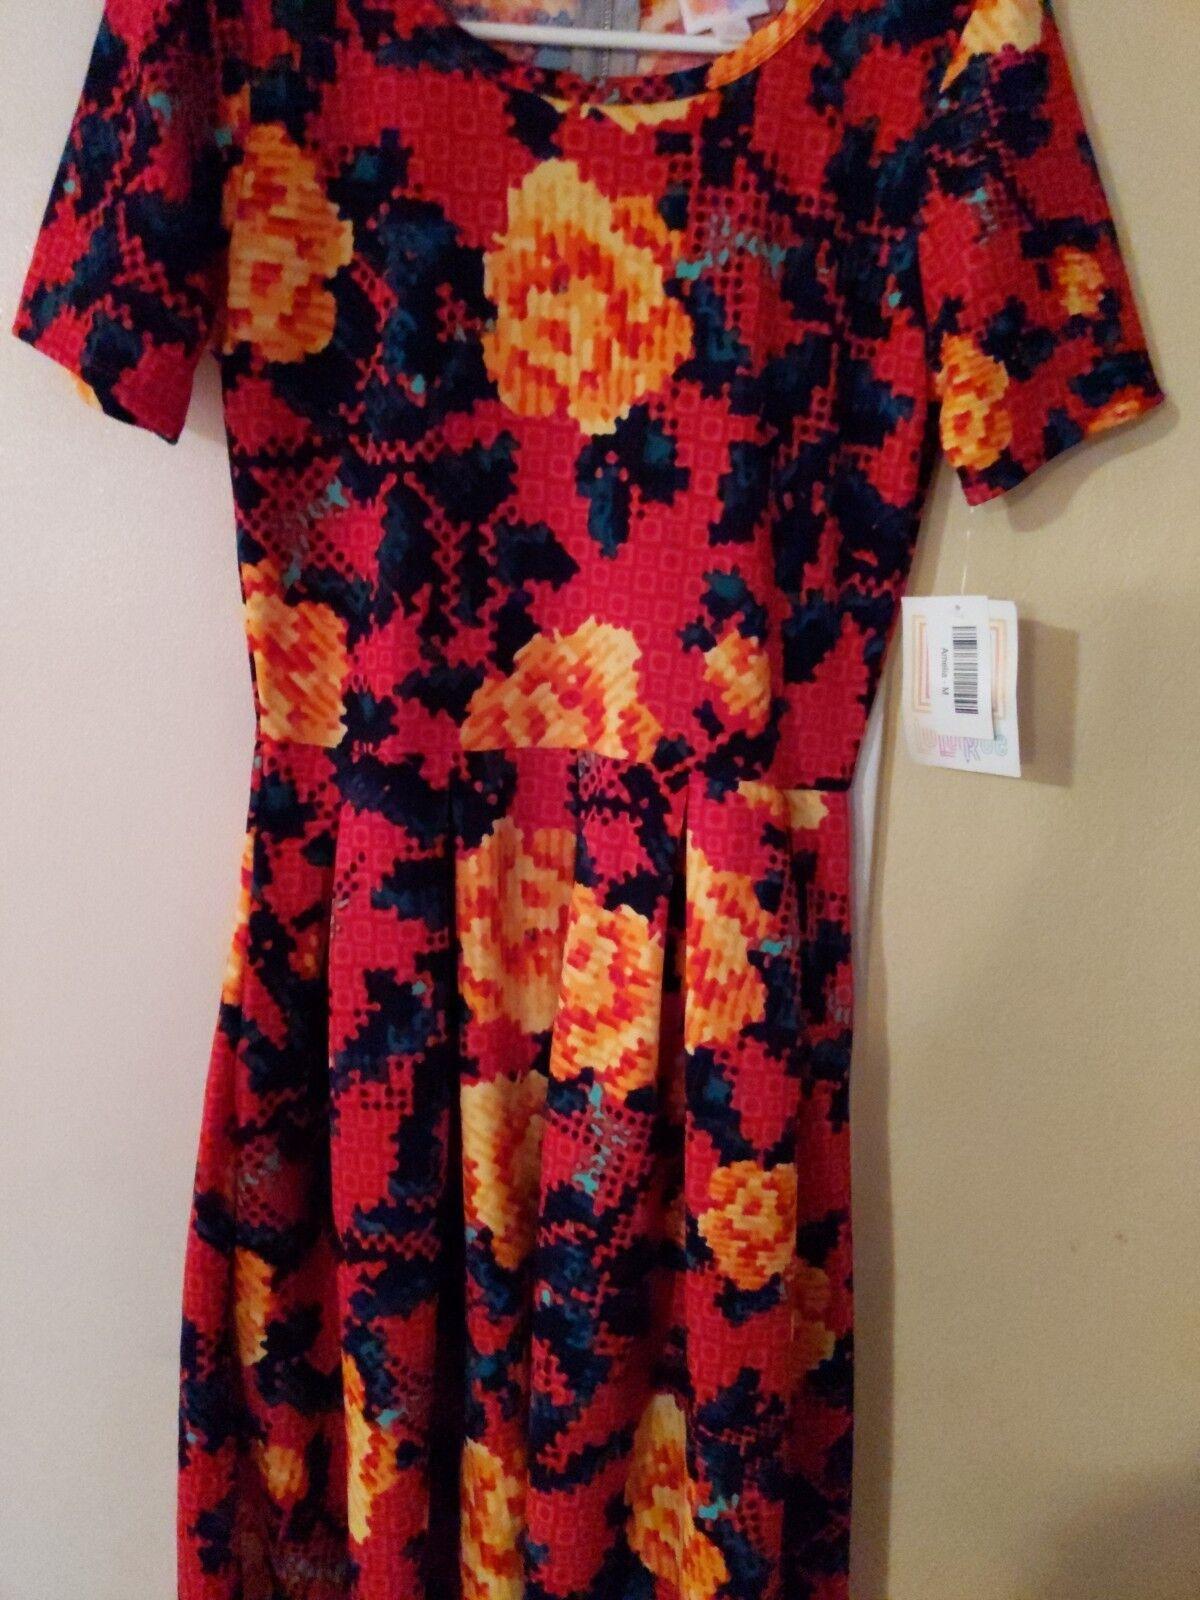 LuLaRoe AMELIA Bright Red Dress Floral Pixel Digital pinks Medium Med NWT Spring